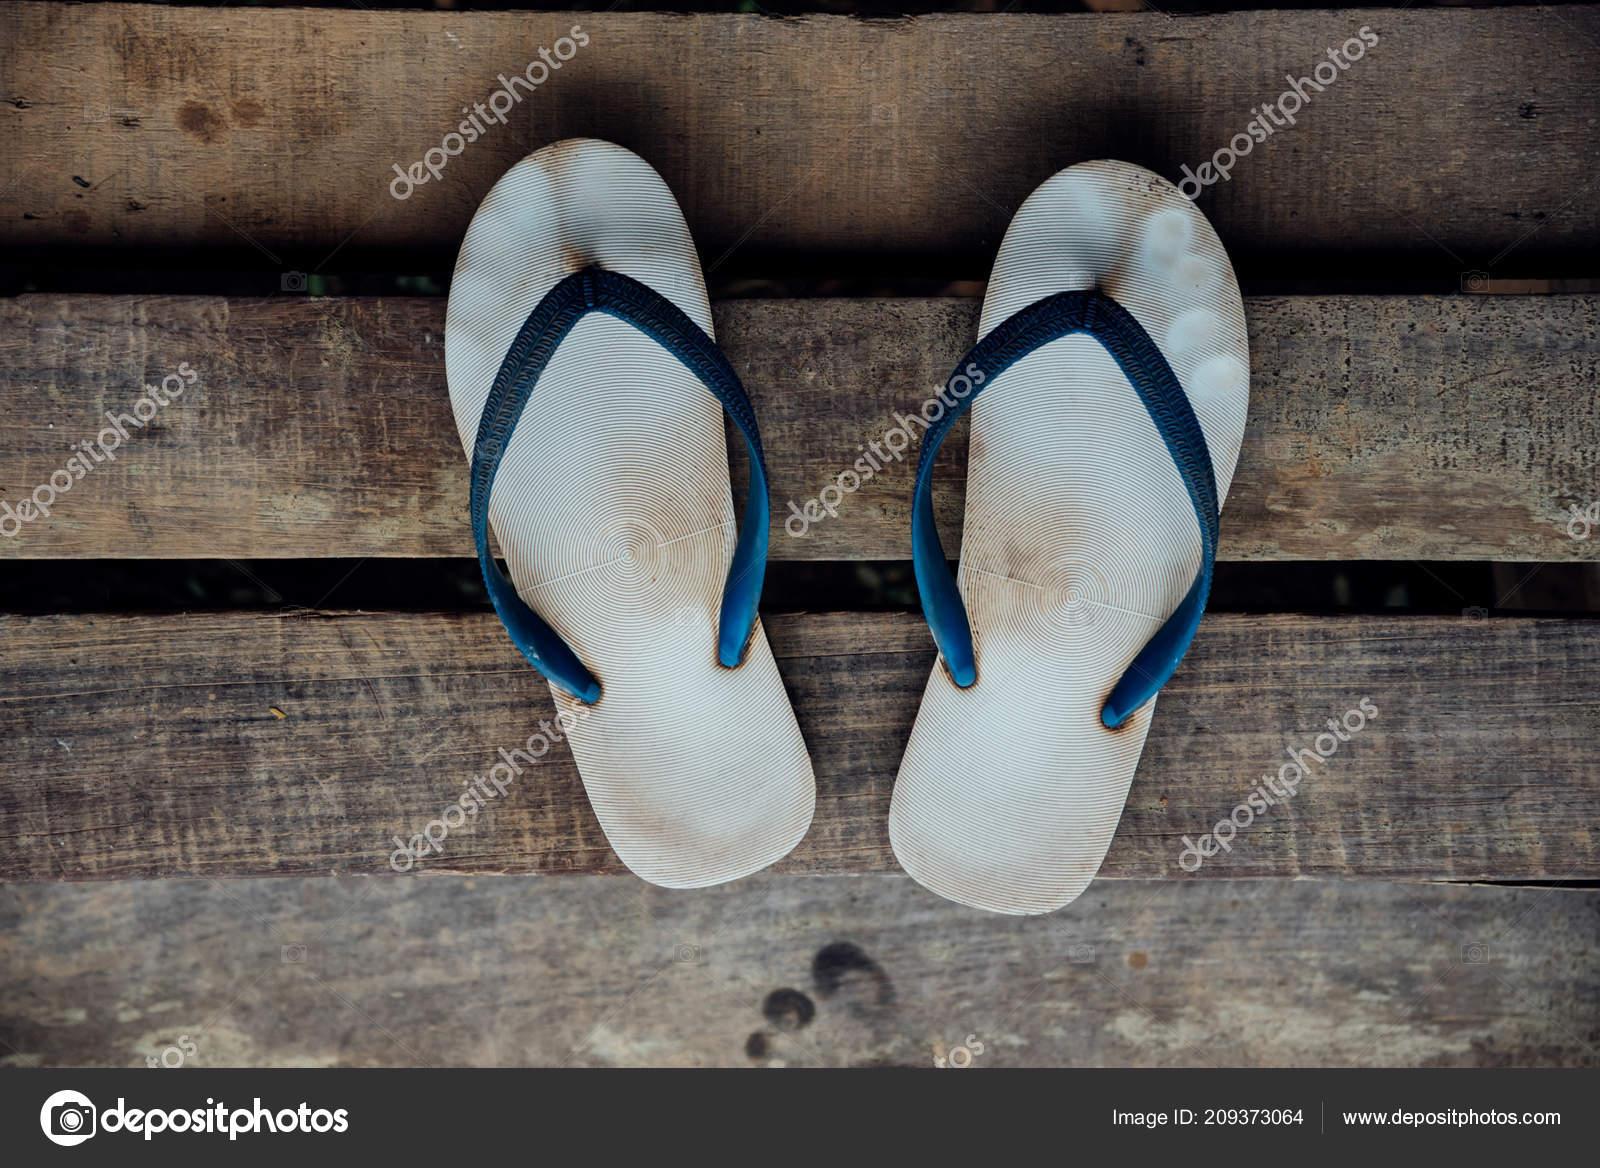 f93e254cc Vintage Sandal Thongs Flip Flop Blue Color Footwear Wooden Staircase —  Stock Photo